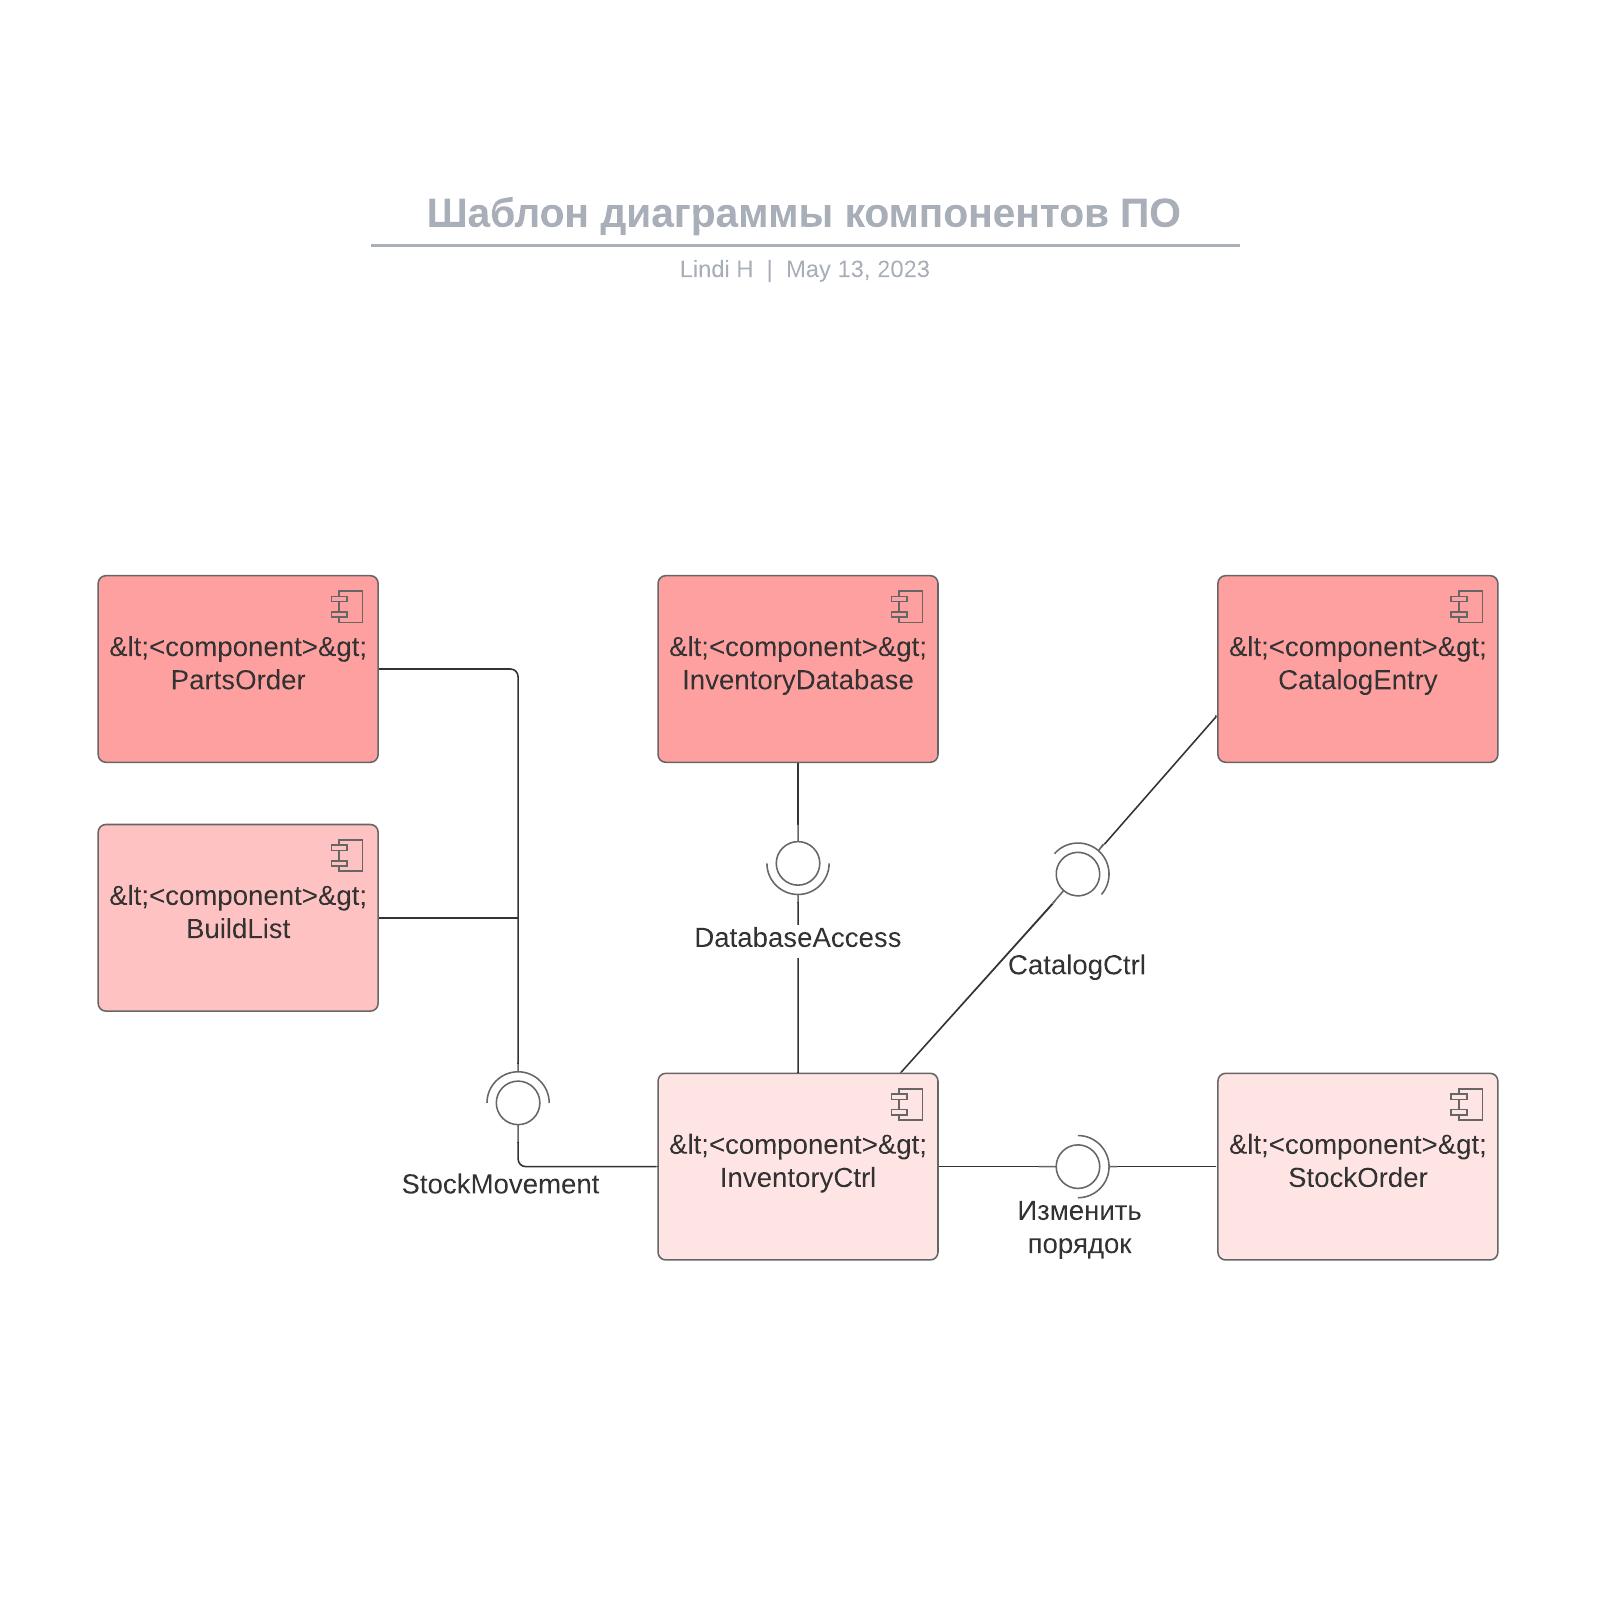 Шаблон диаграммы компонентов ПО